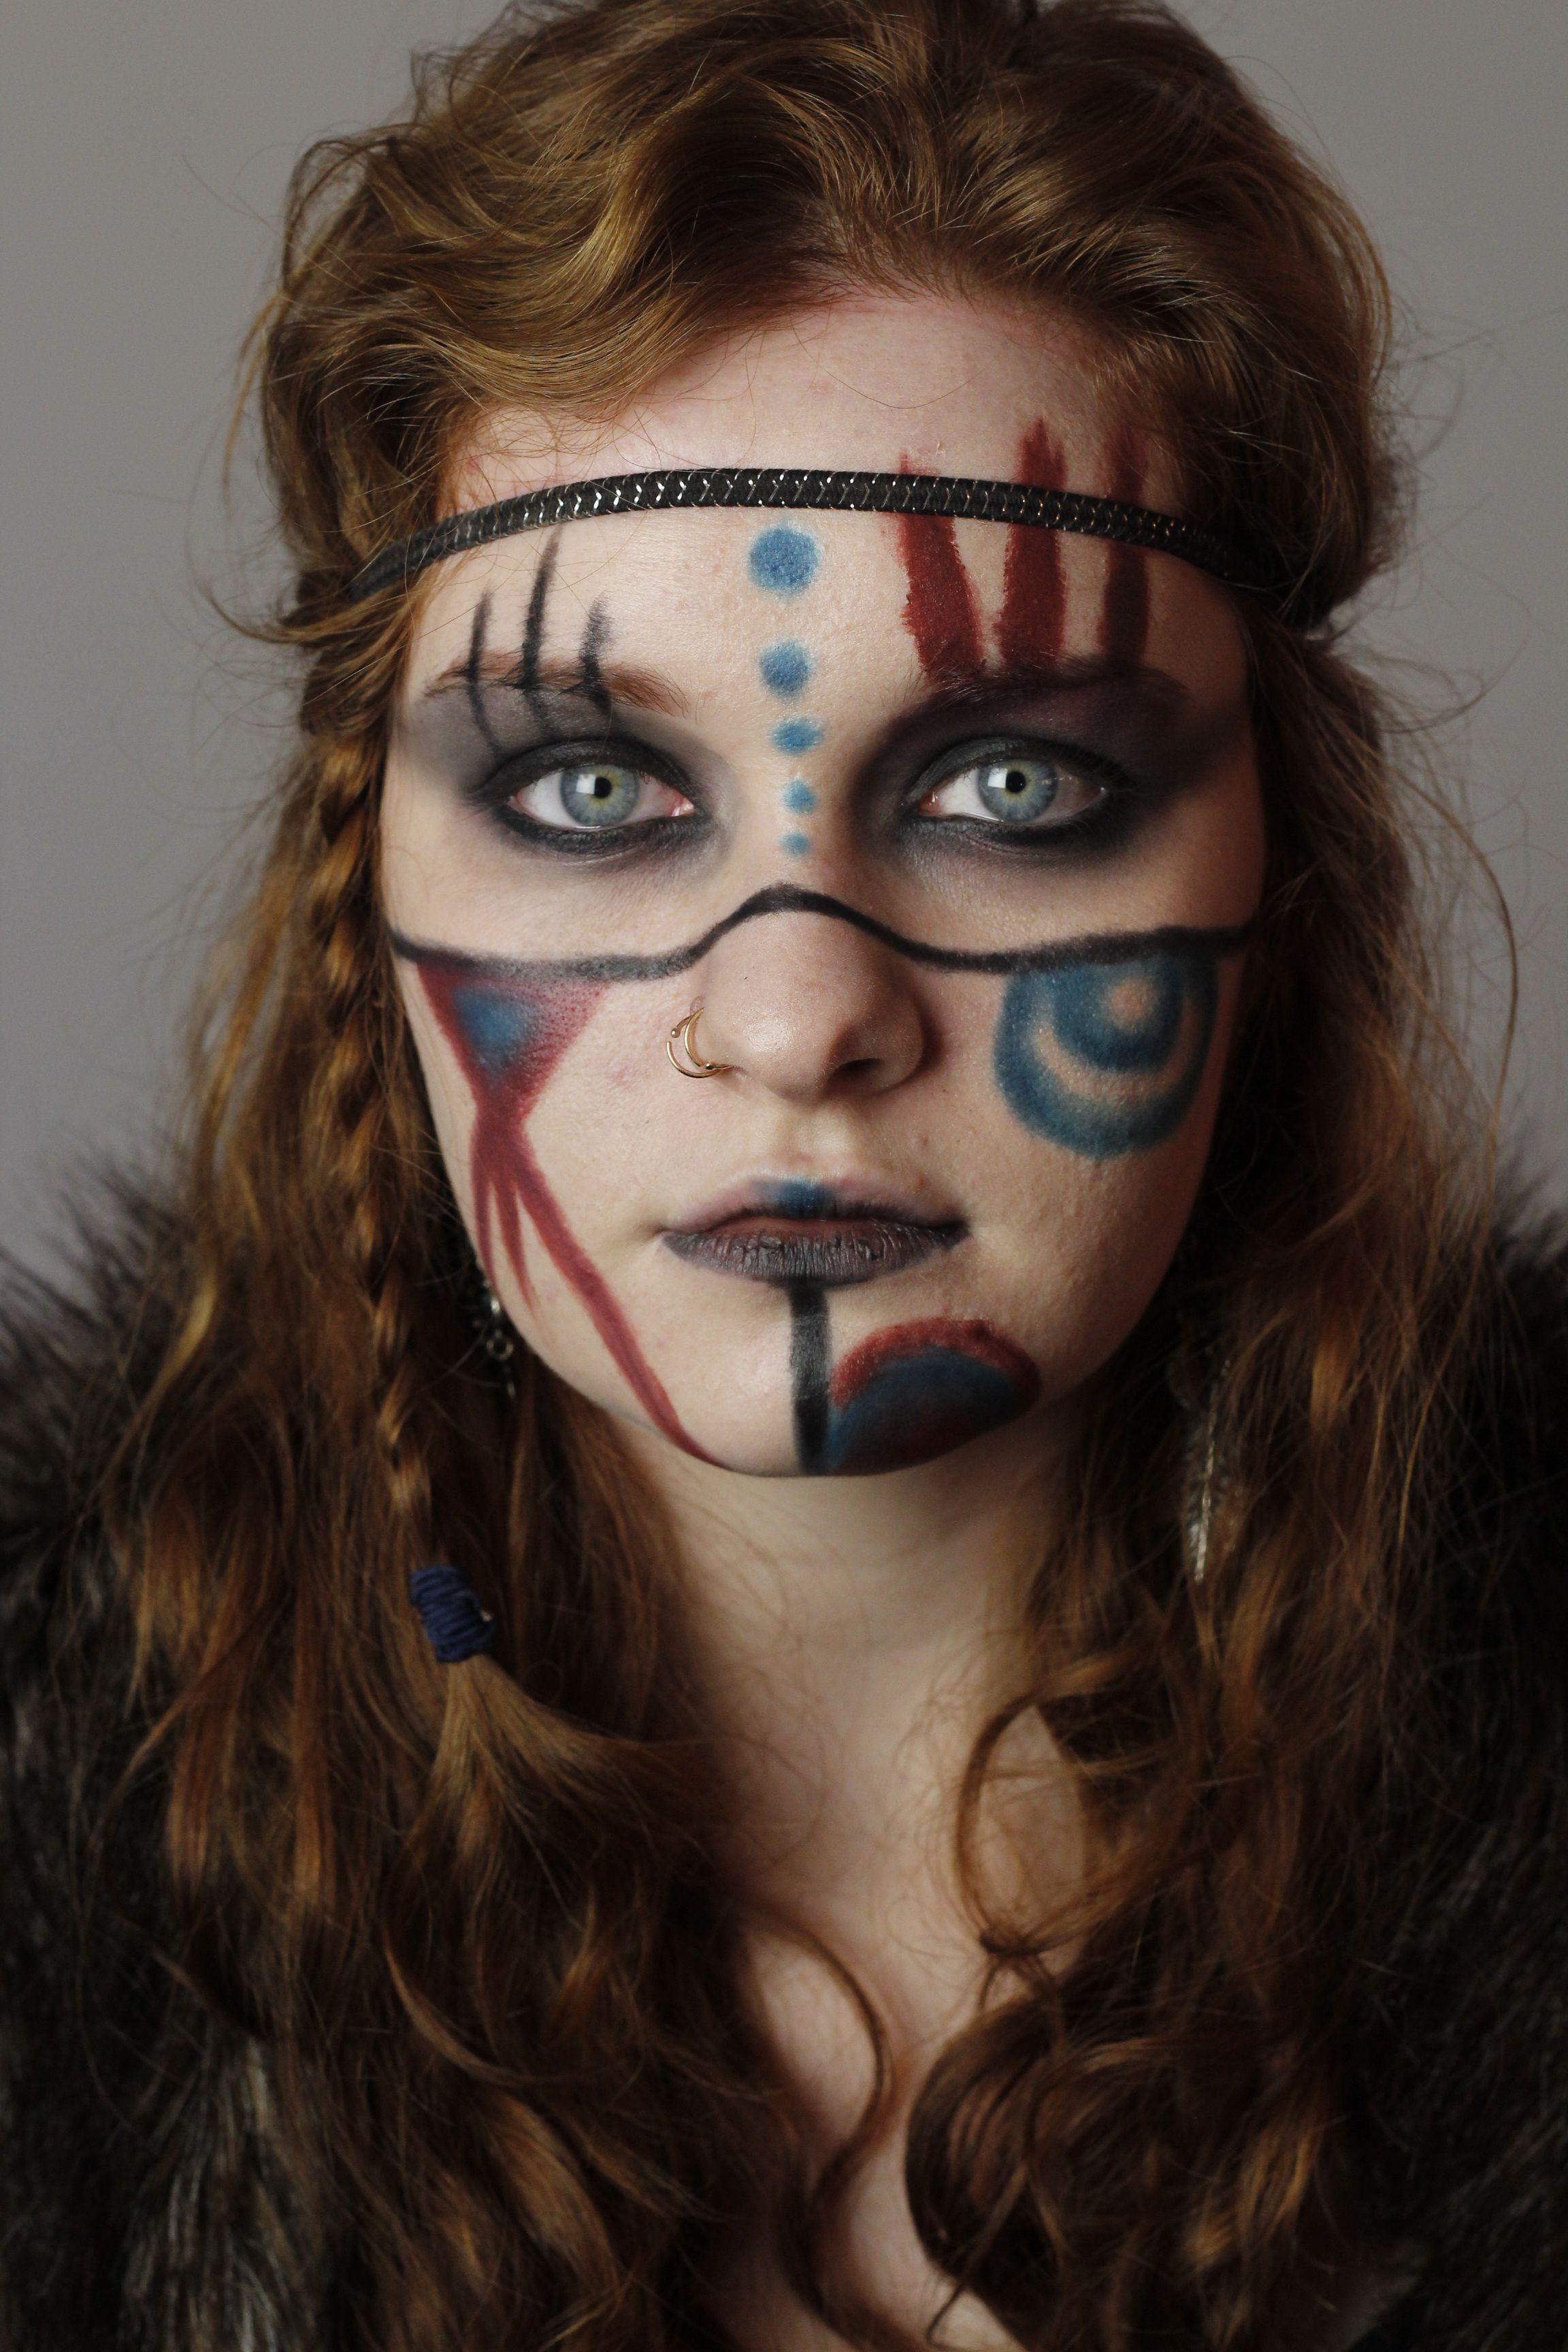 Ethnic makeup, nordic warrior princess